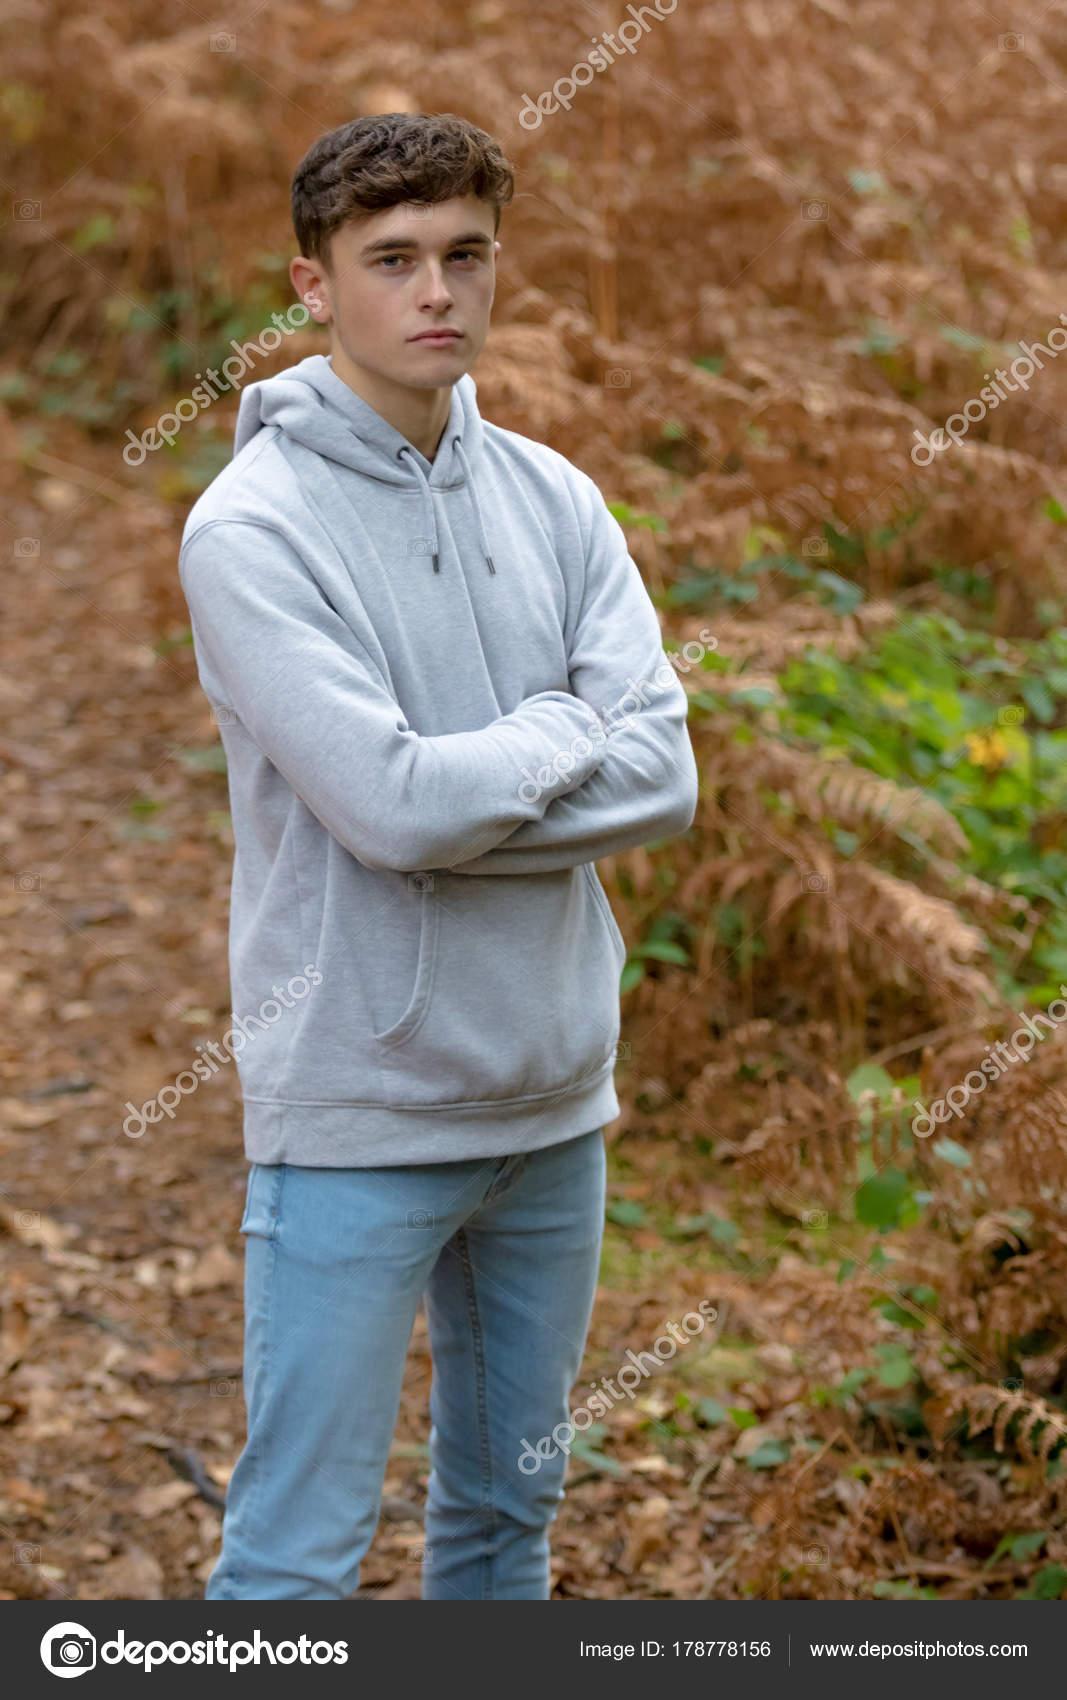 18 Years Old Vietnamese: 18 Year Old Teenage Boy Outside